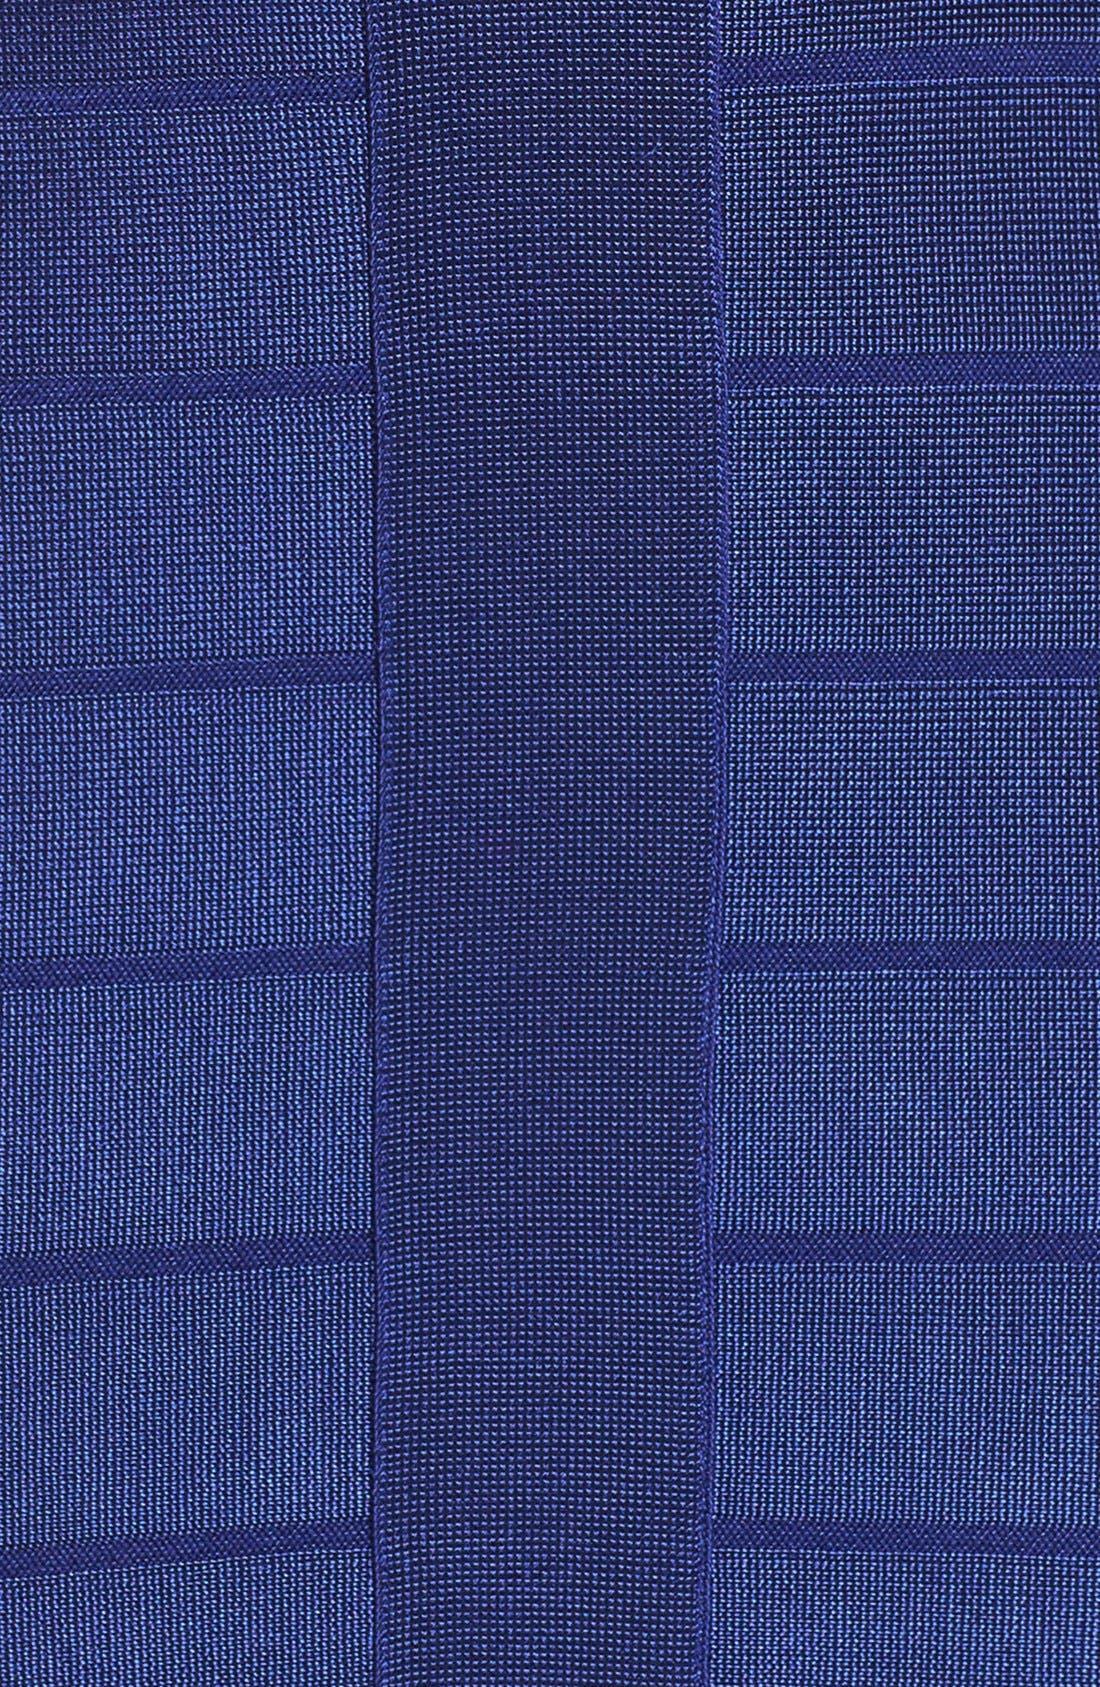 Spotlight Bandage Dress,                             Alternate thumbnail 6, color,                             Maya Blue